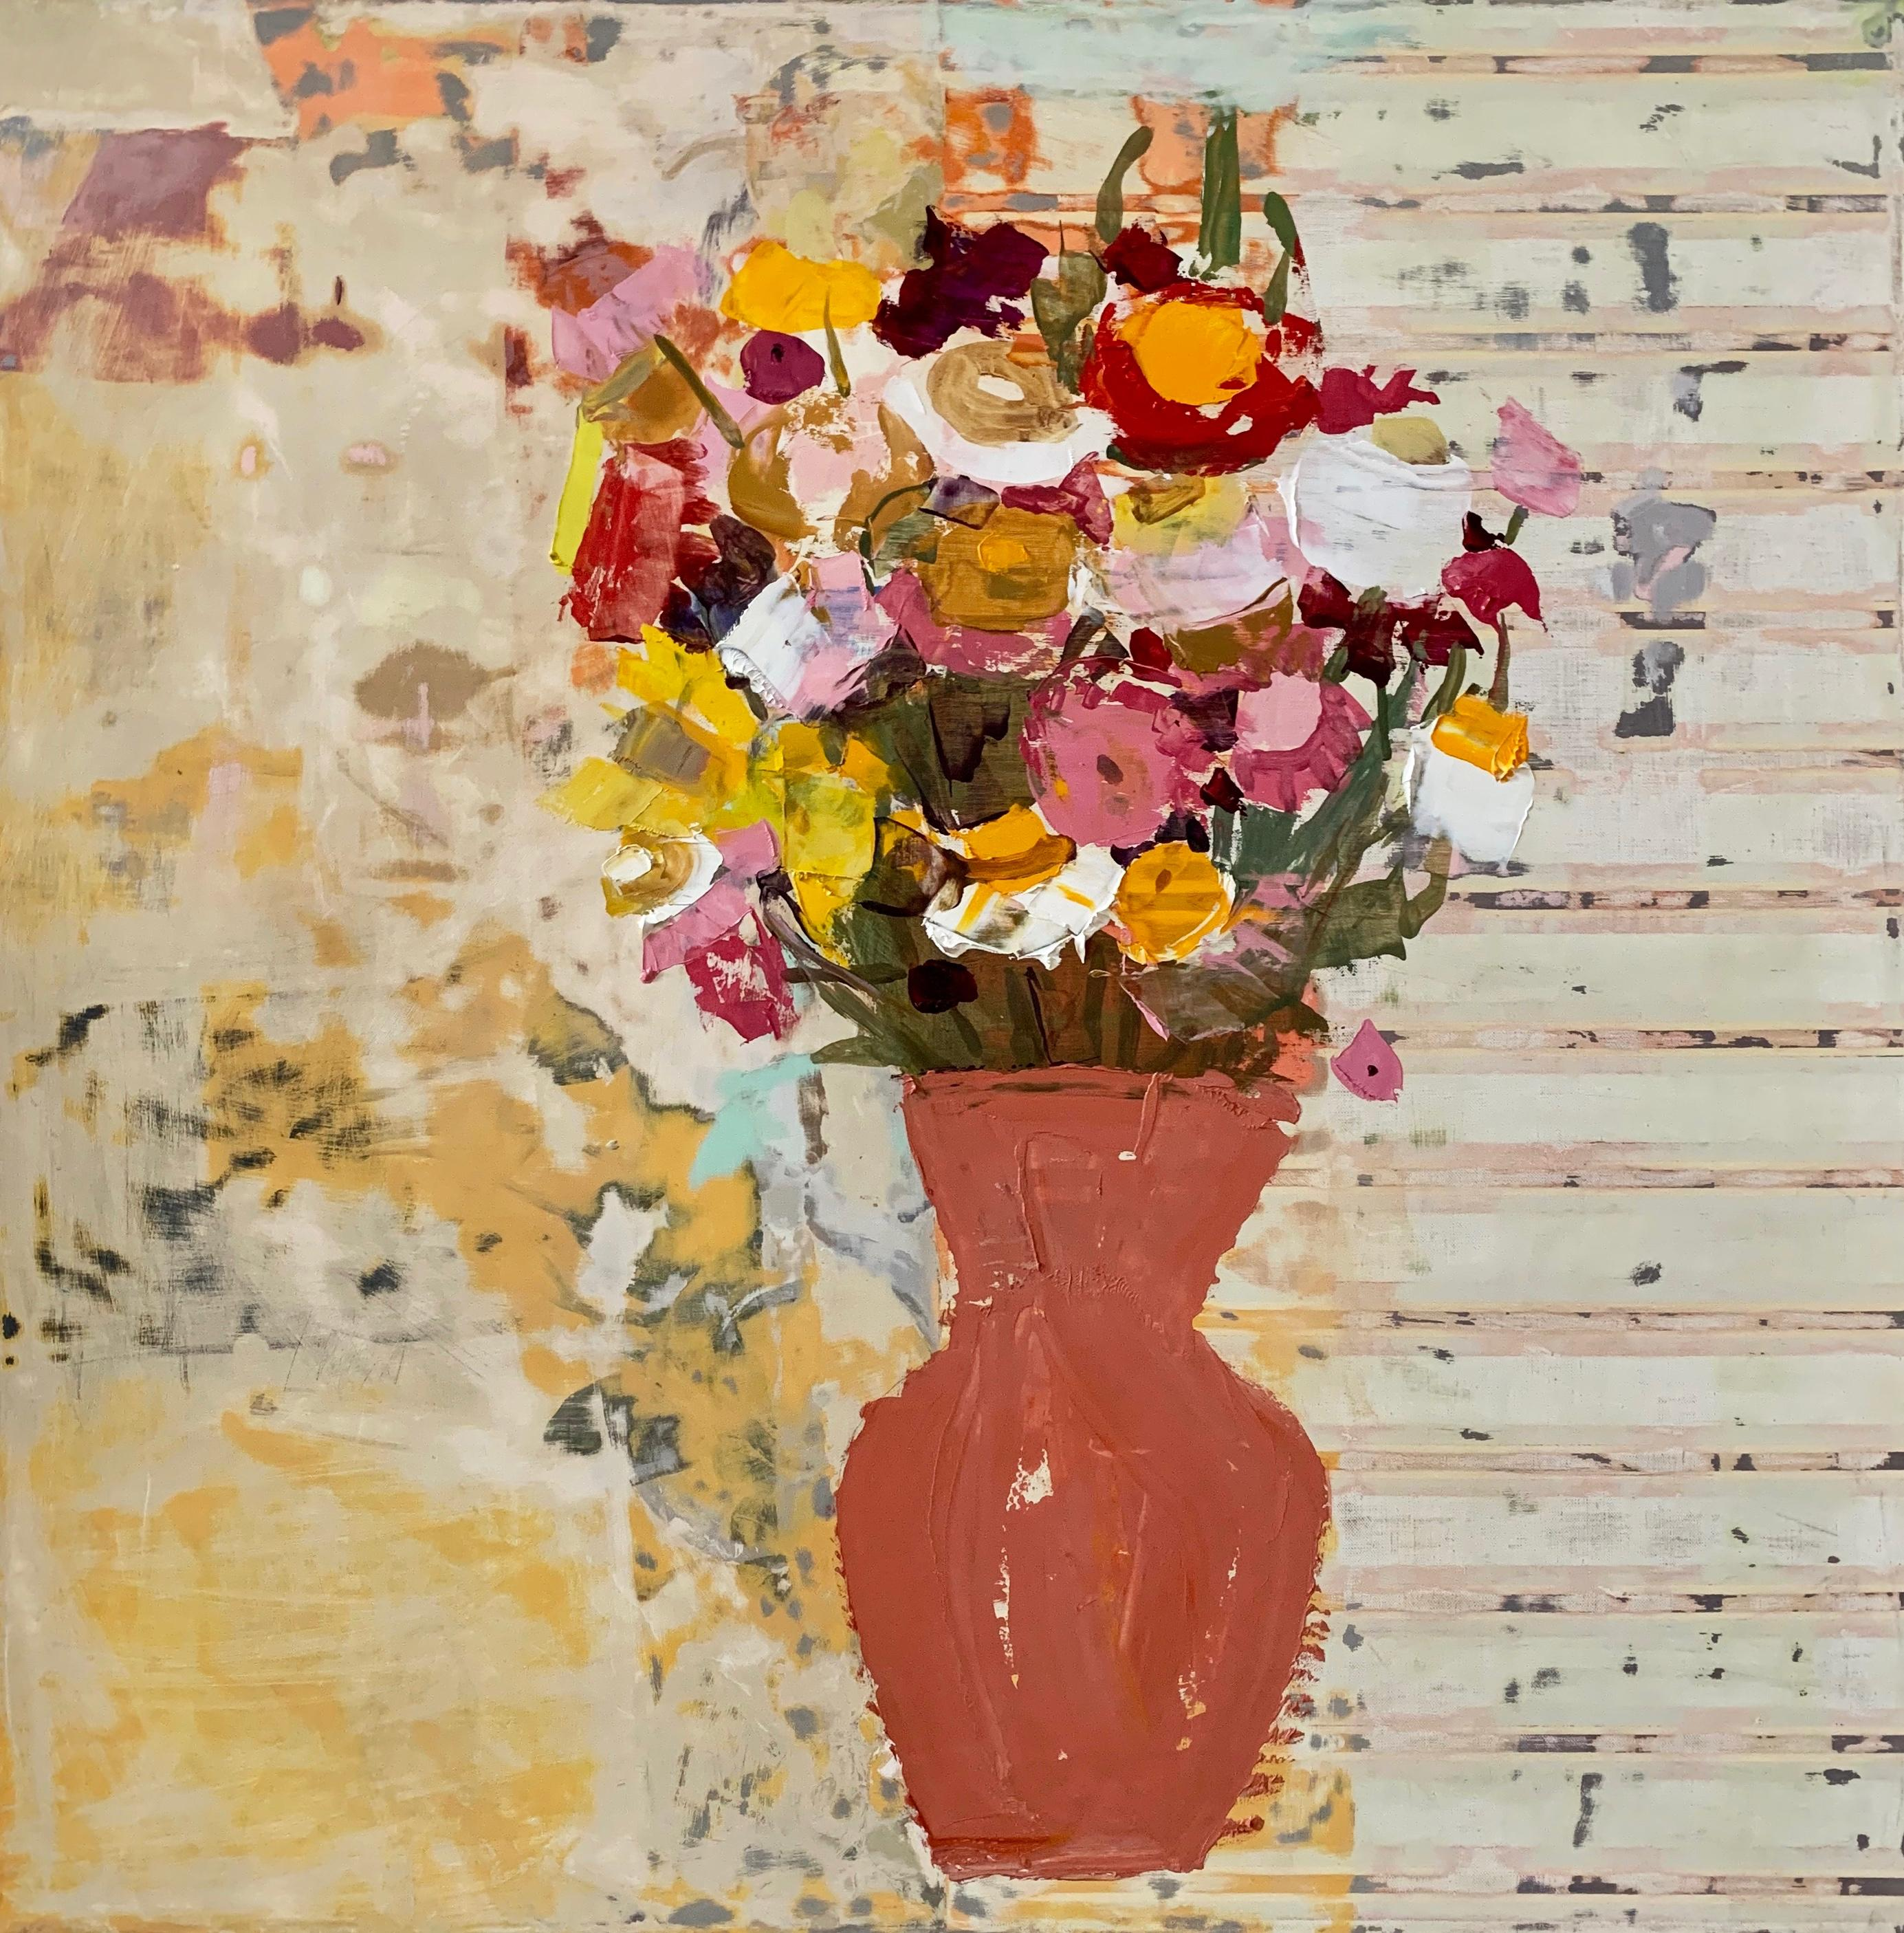 Still Life with Flower in Vase